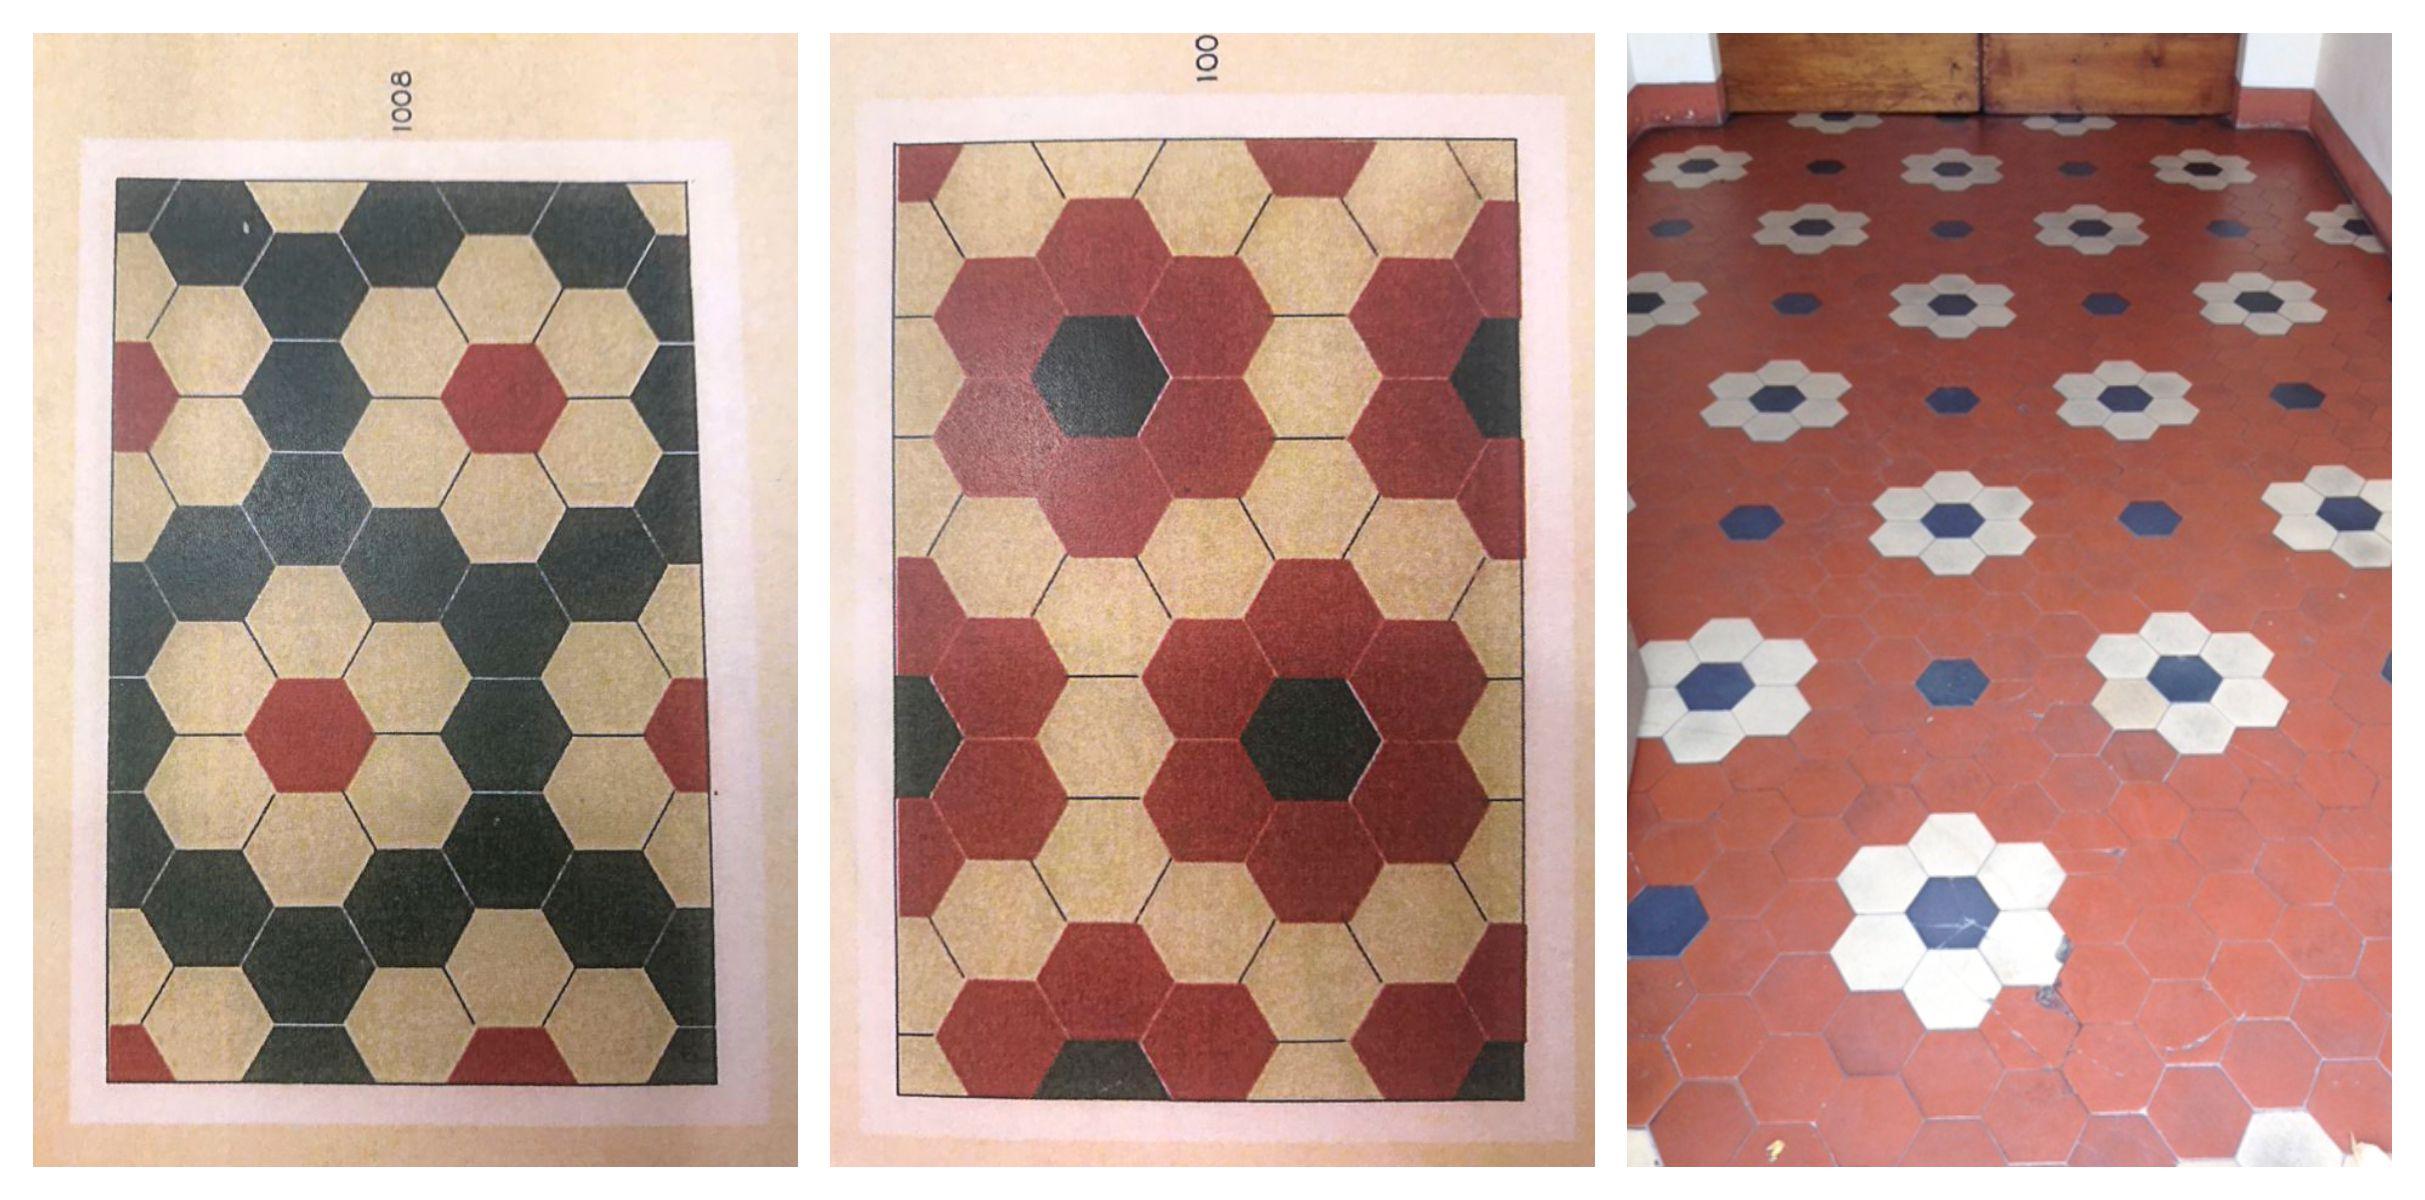 L'album pavimenti cementine-esagonali vintage di hometreschic